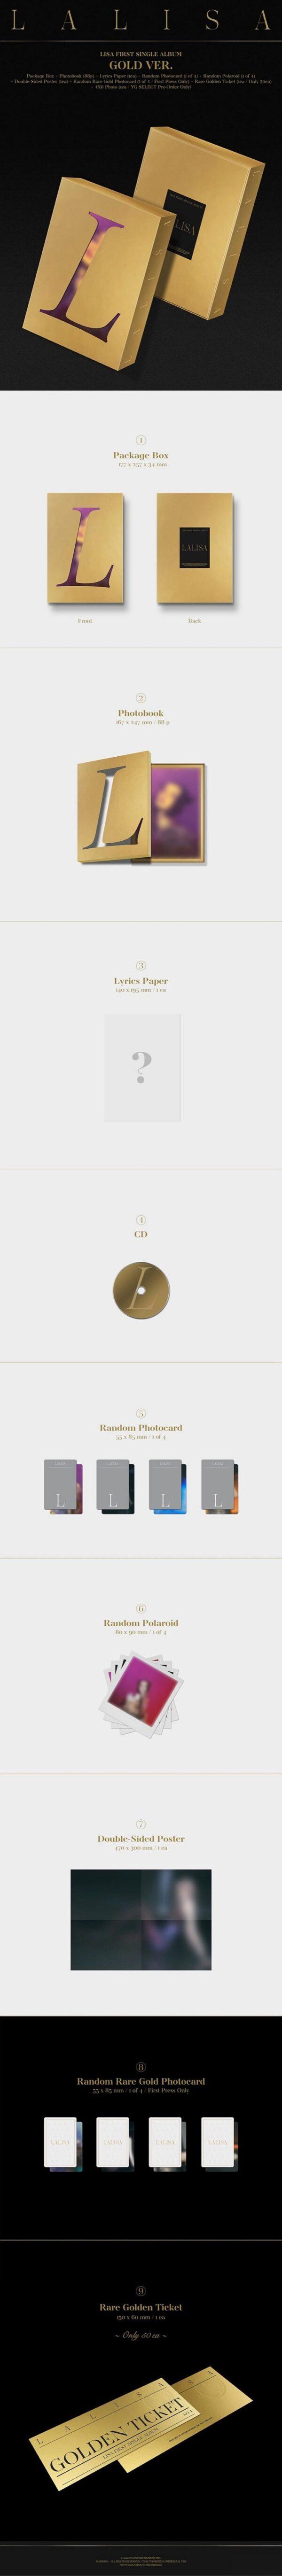 1st Single Album de LISA BLACKPINK LALISA GOLD Ver. 1